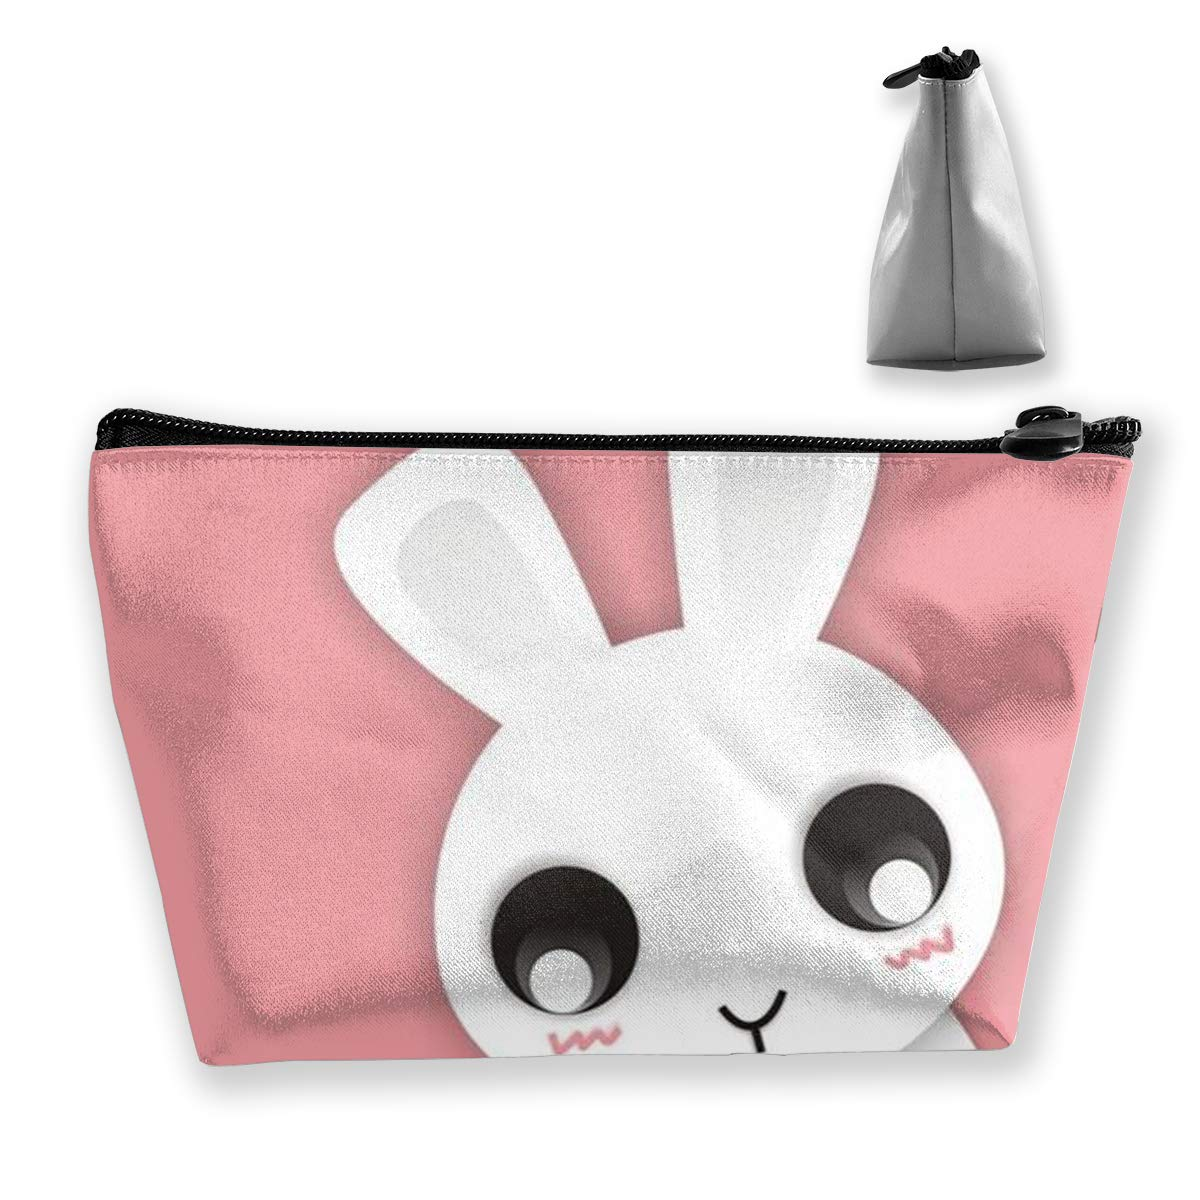 e4144ee23030 Amazon.com: customgogo Women's Kawaii Onigiri Travel Makeup Bags ...